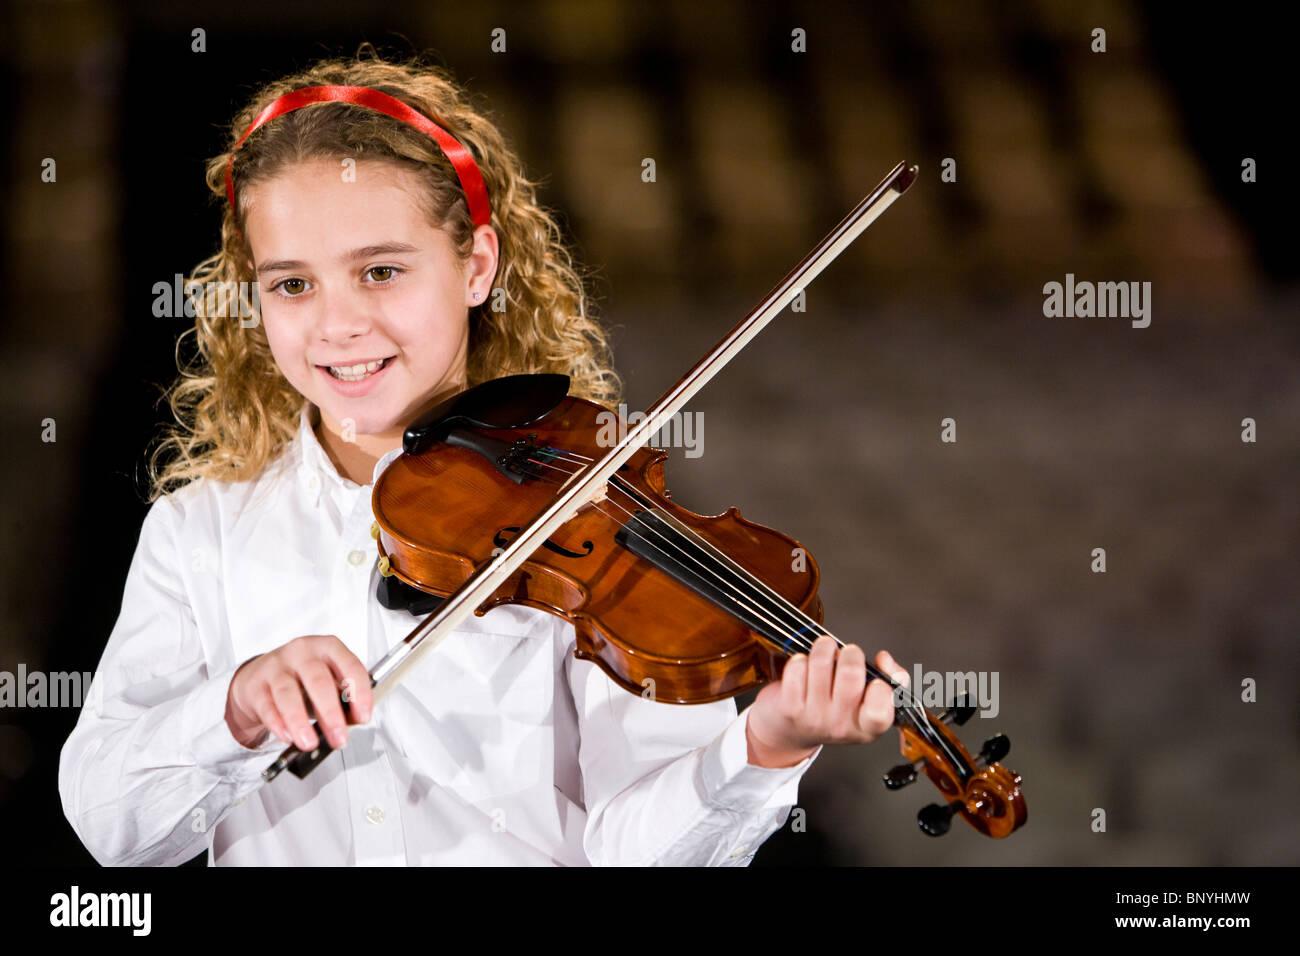 Young girl playing violin music - Stock Image